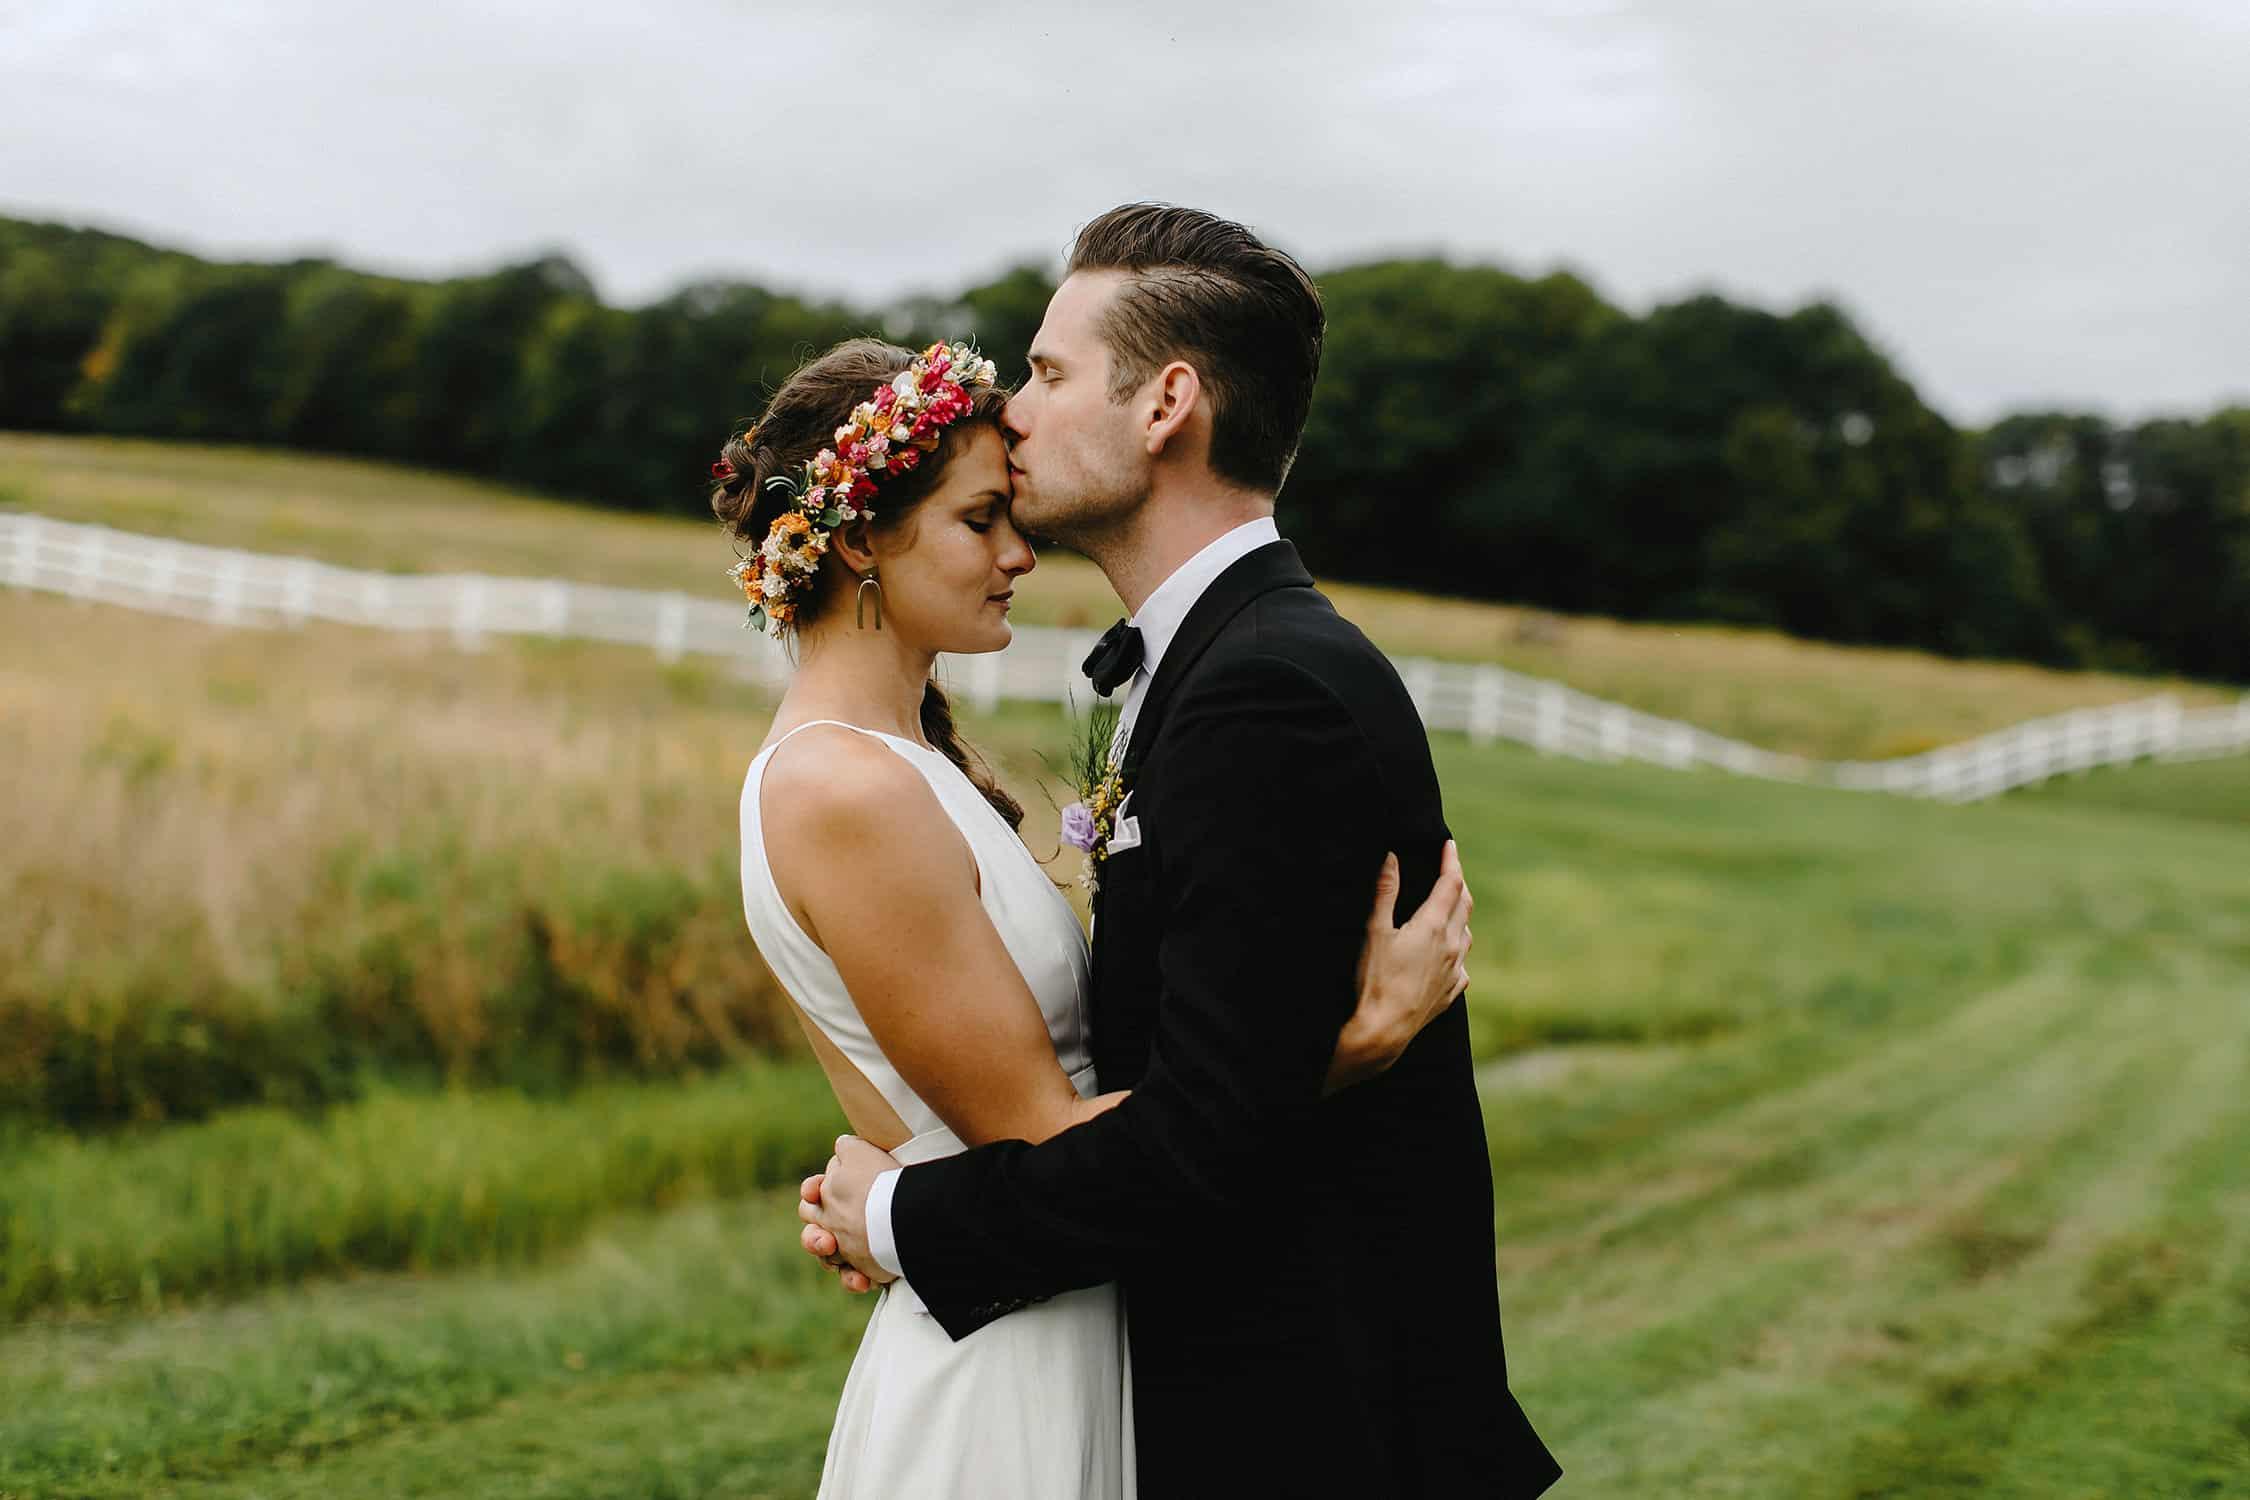 Boho Chic Catskills Wedding at Stone Tavern Farm